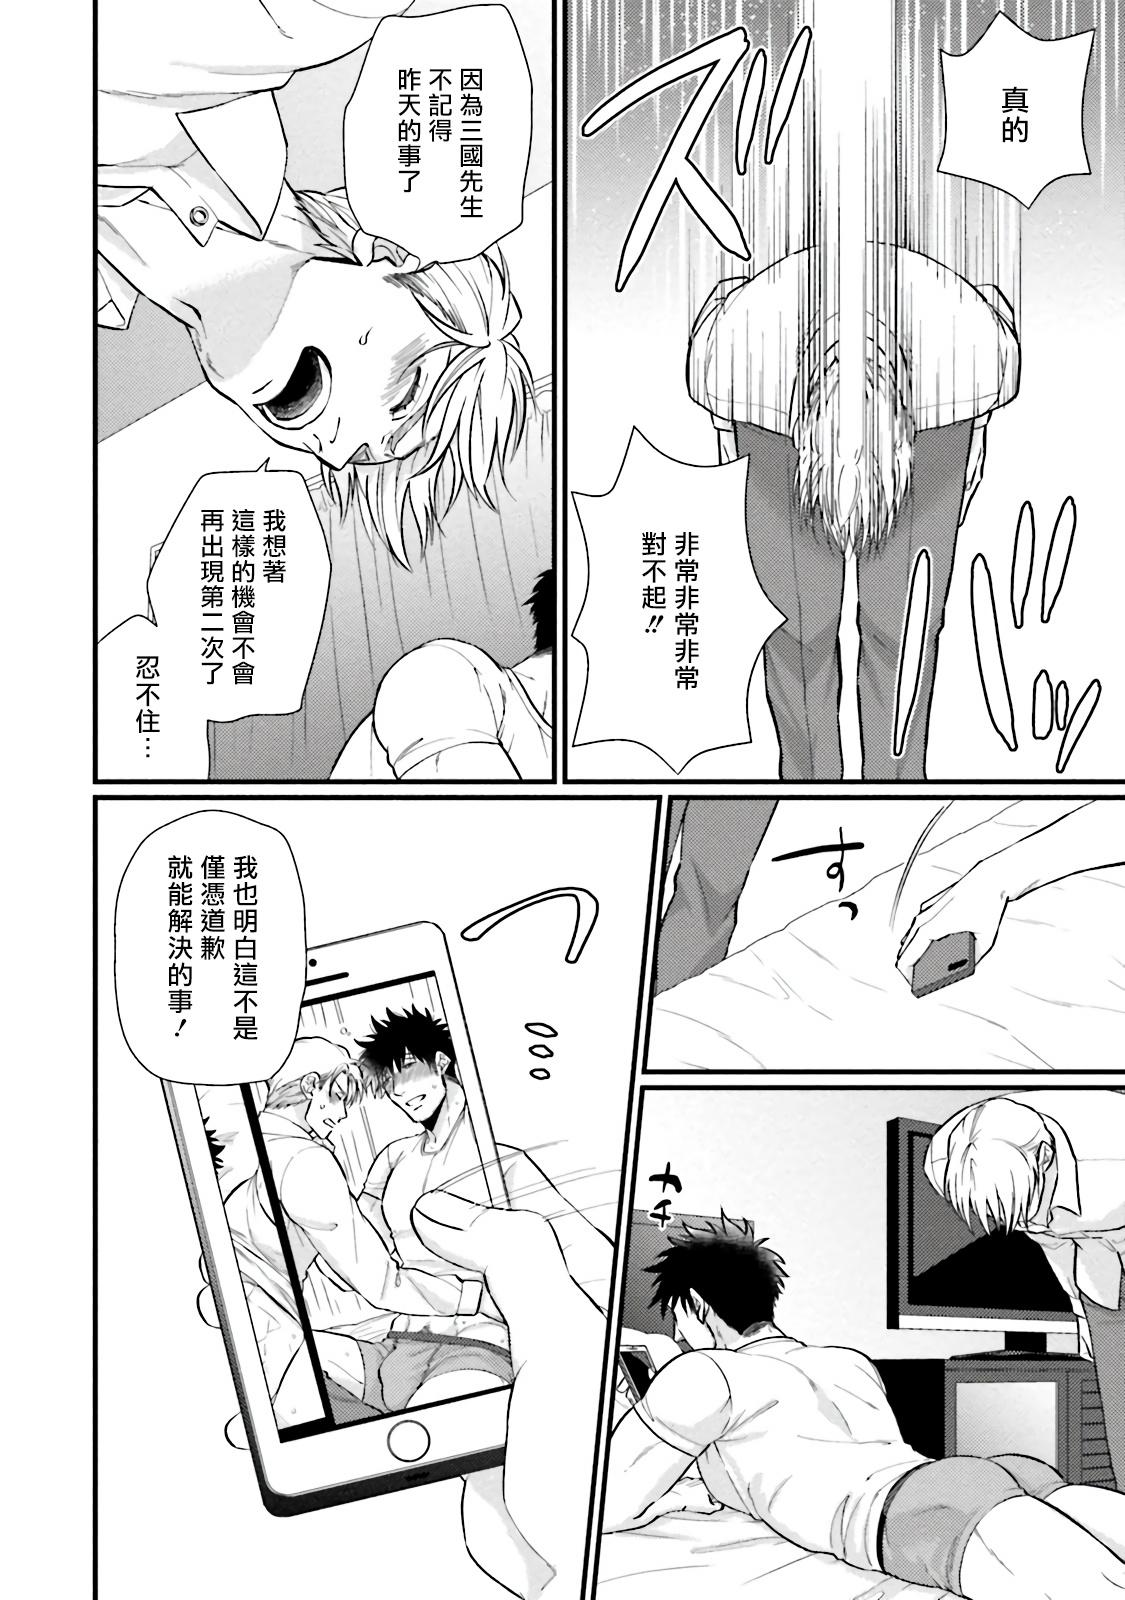 Kinou wa Otanoshimi Deshita ne | 昨天过得很愉快吧 Ch. 1-4+特典 127